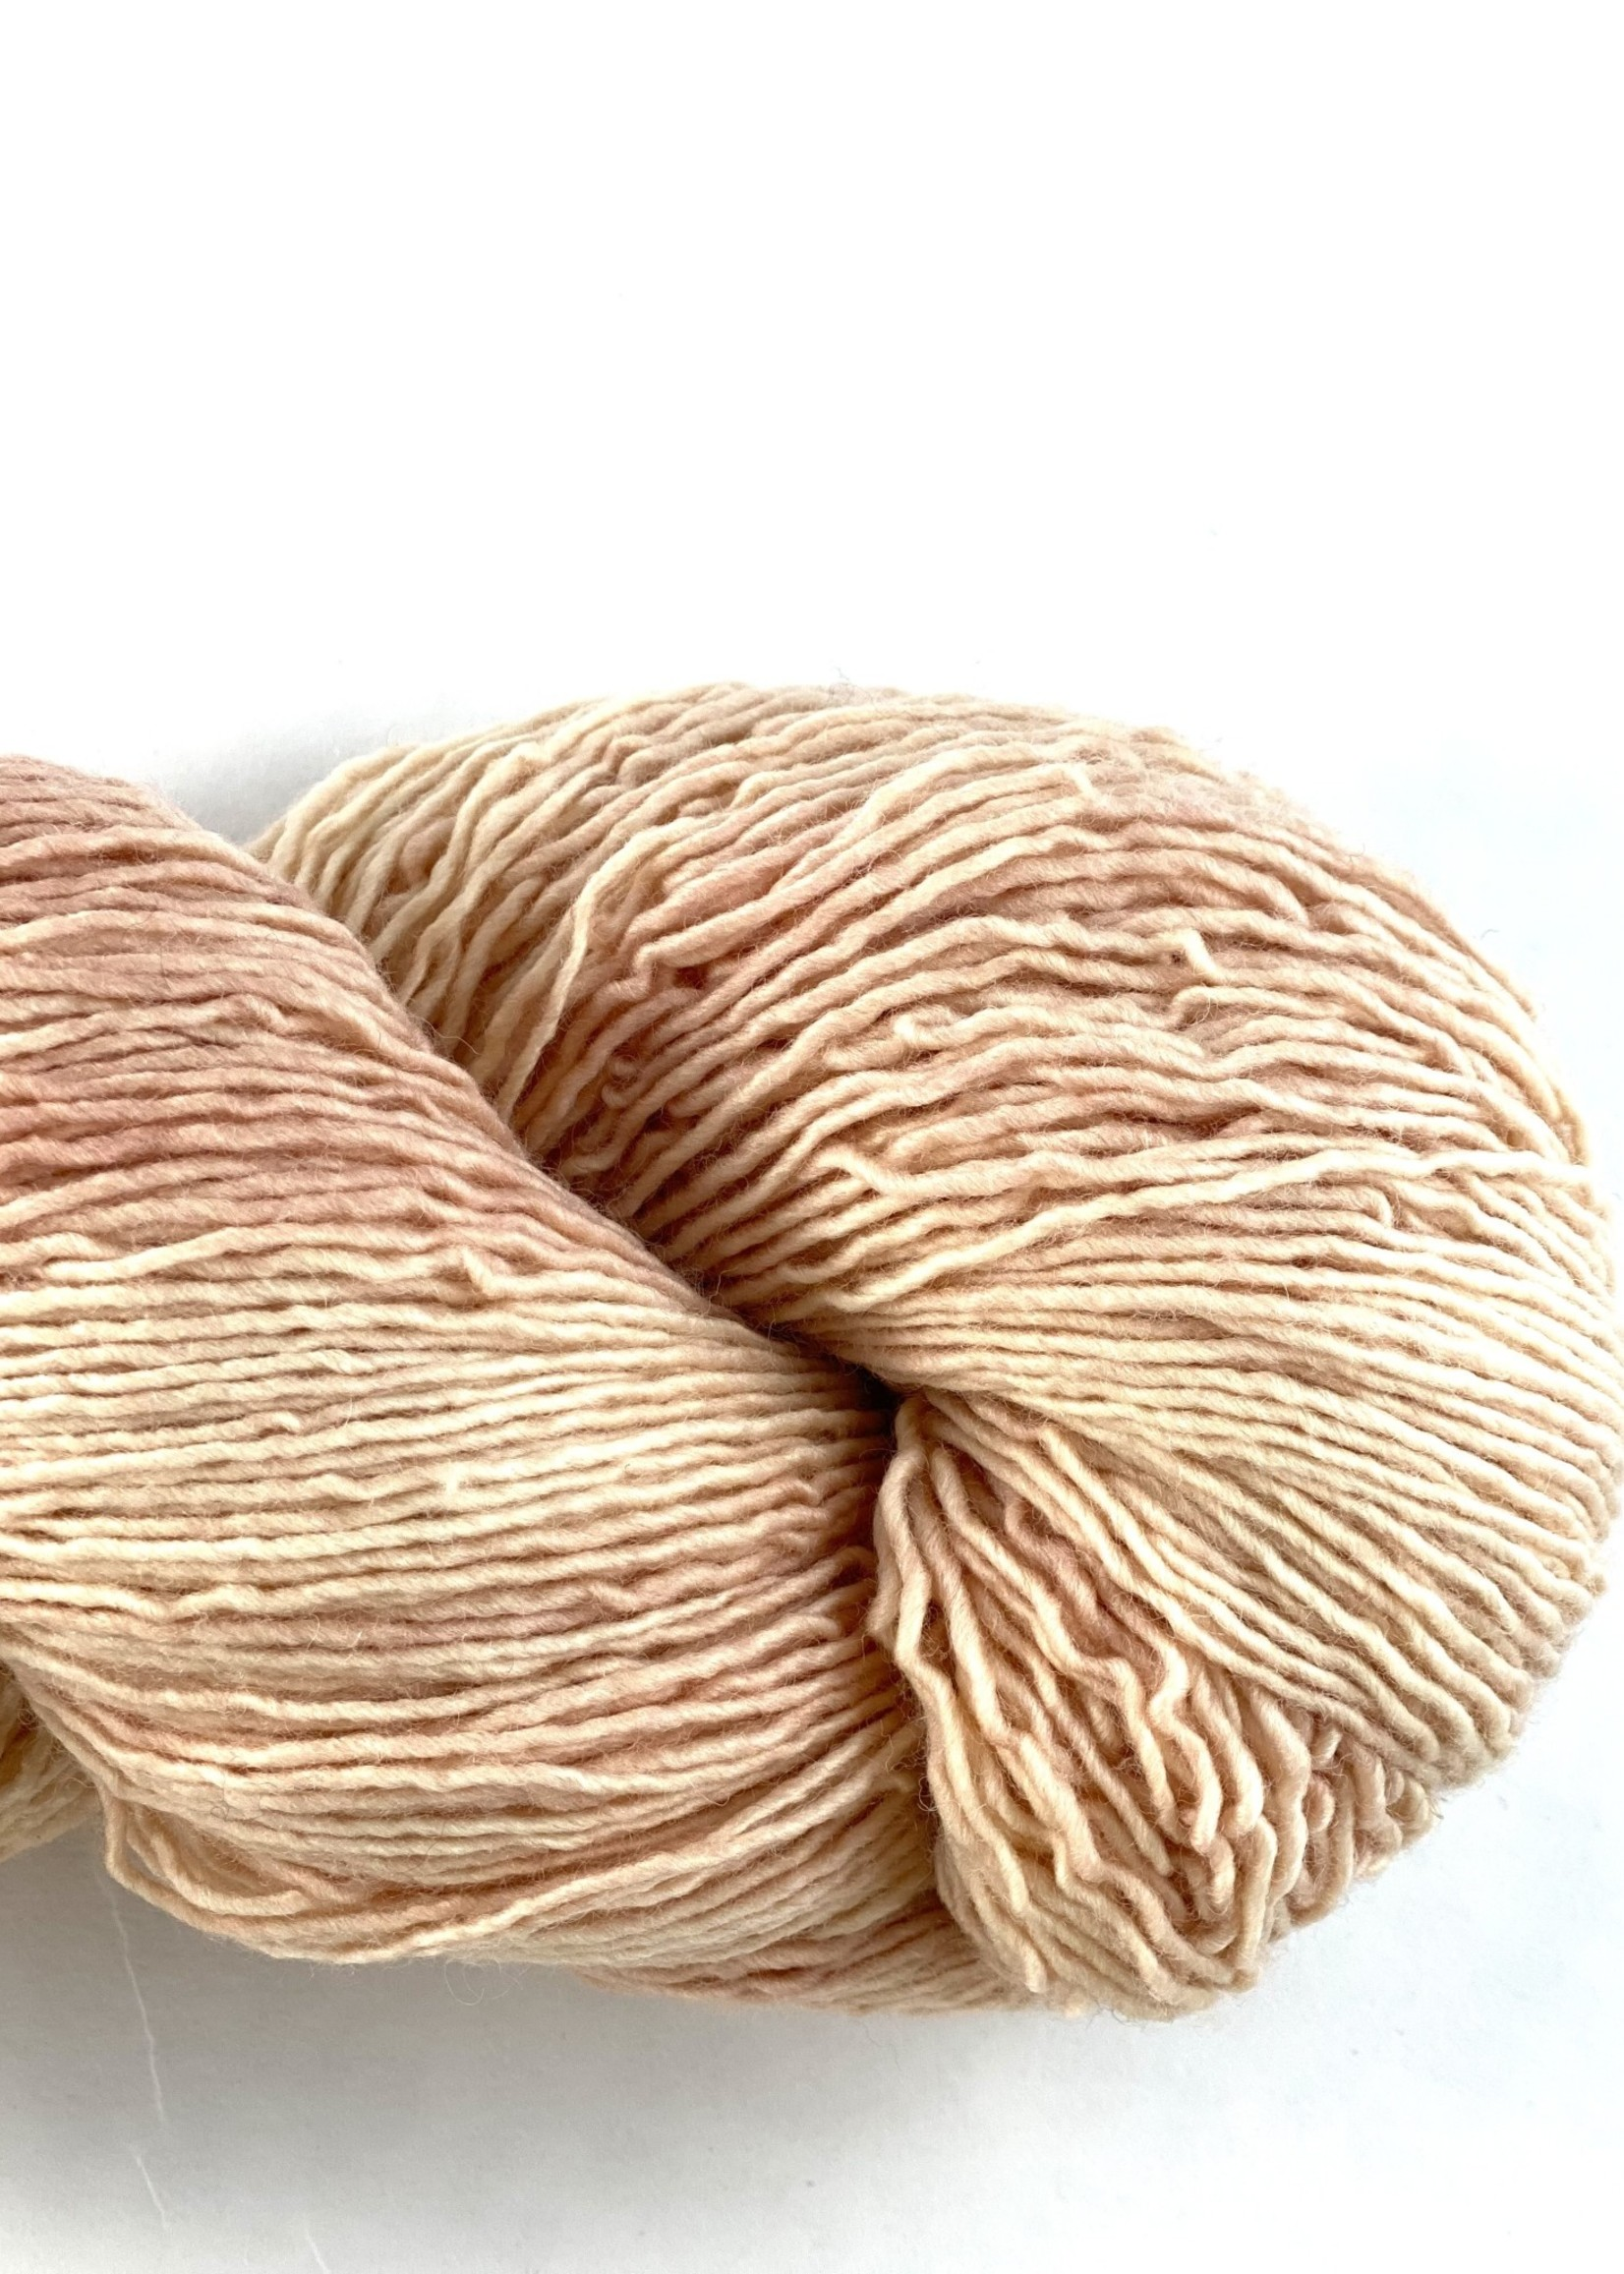 Fleece Artist Yarn Fleece Artist Merino Slim Apricot